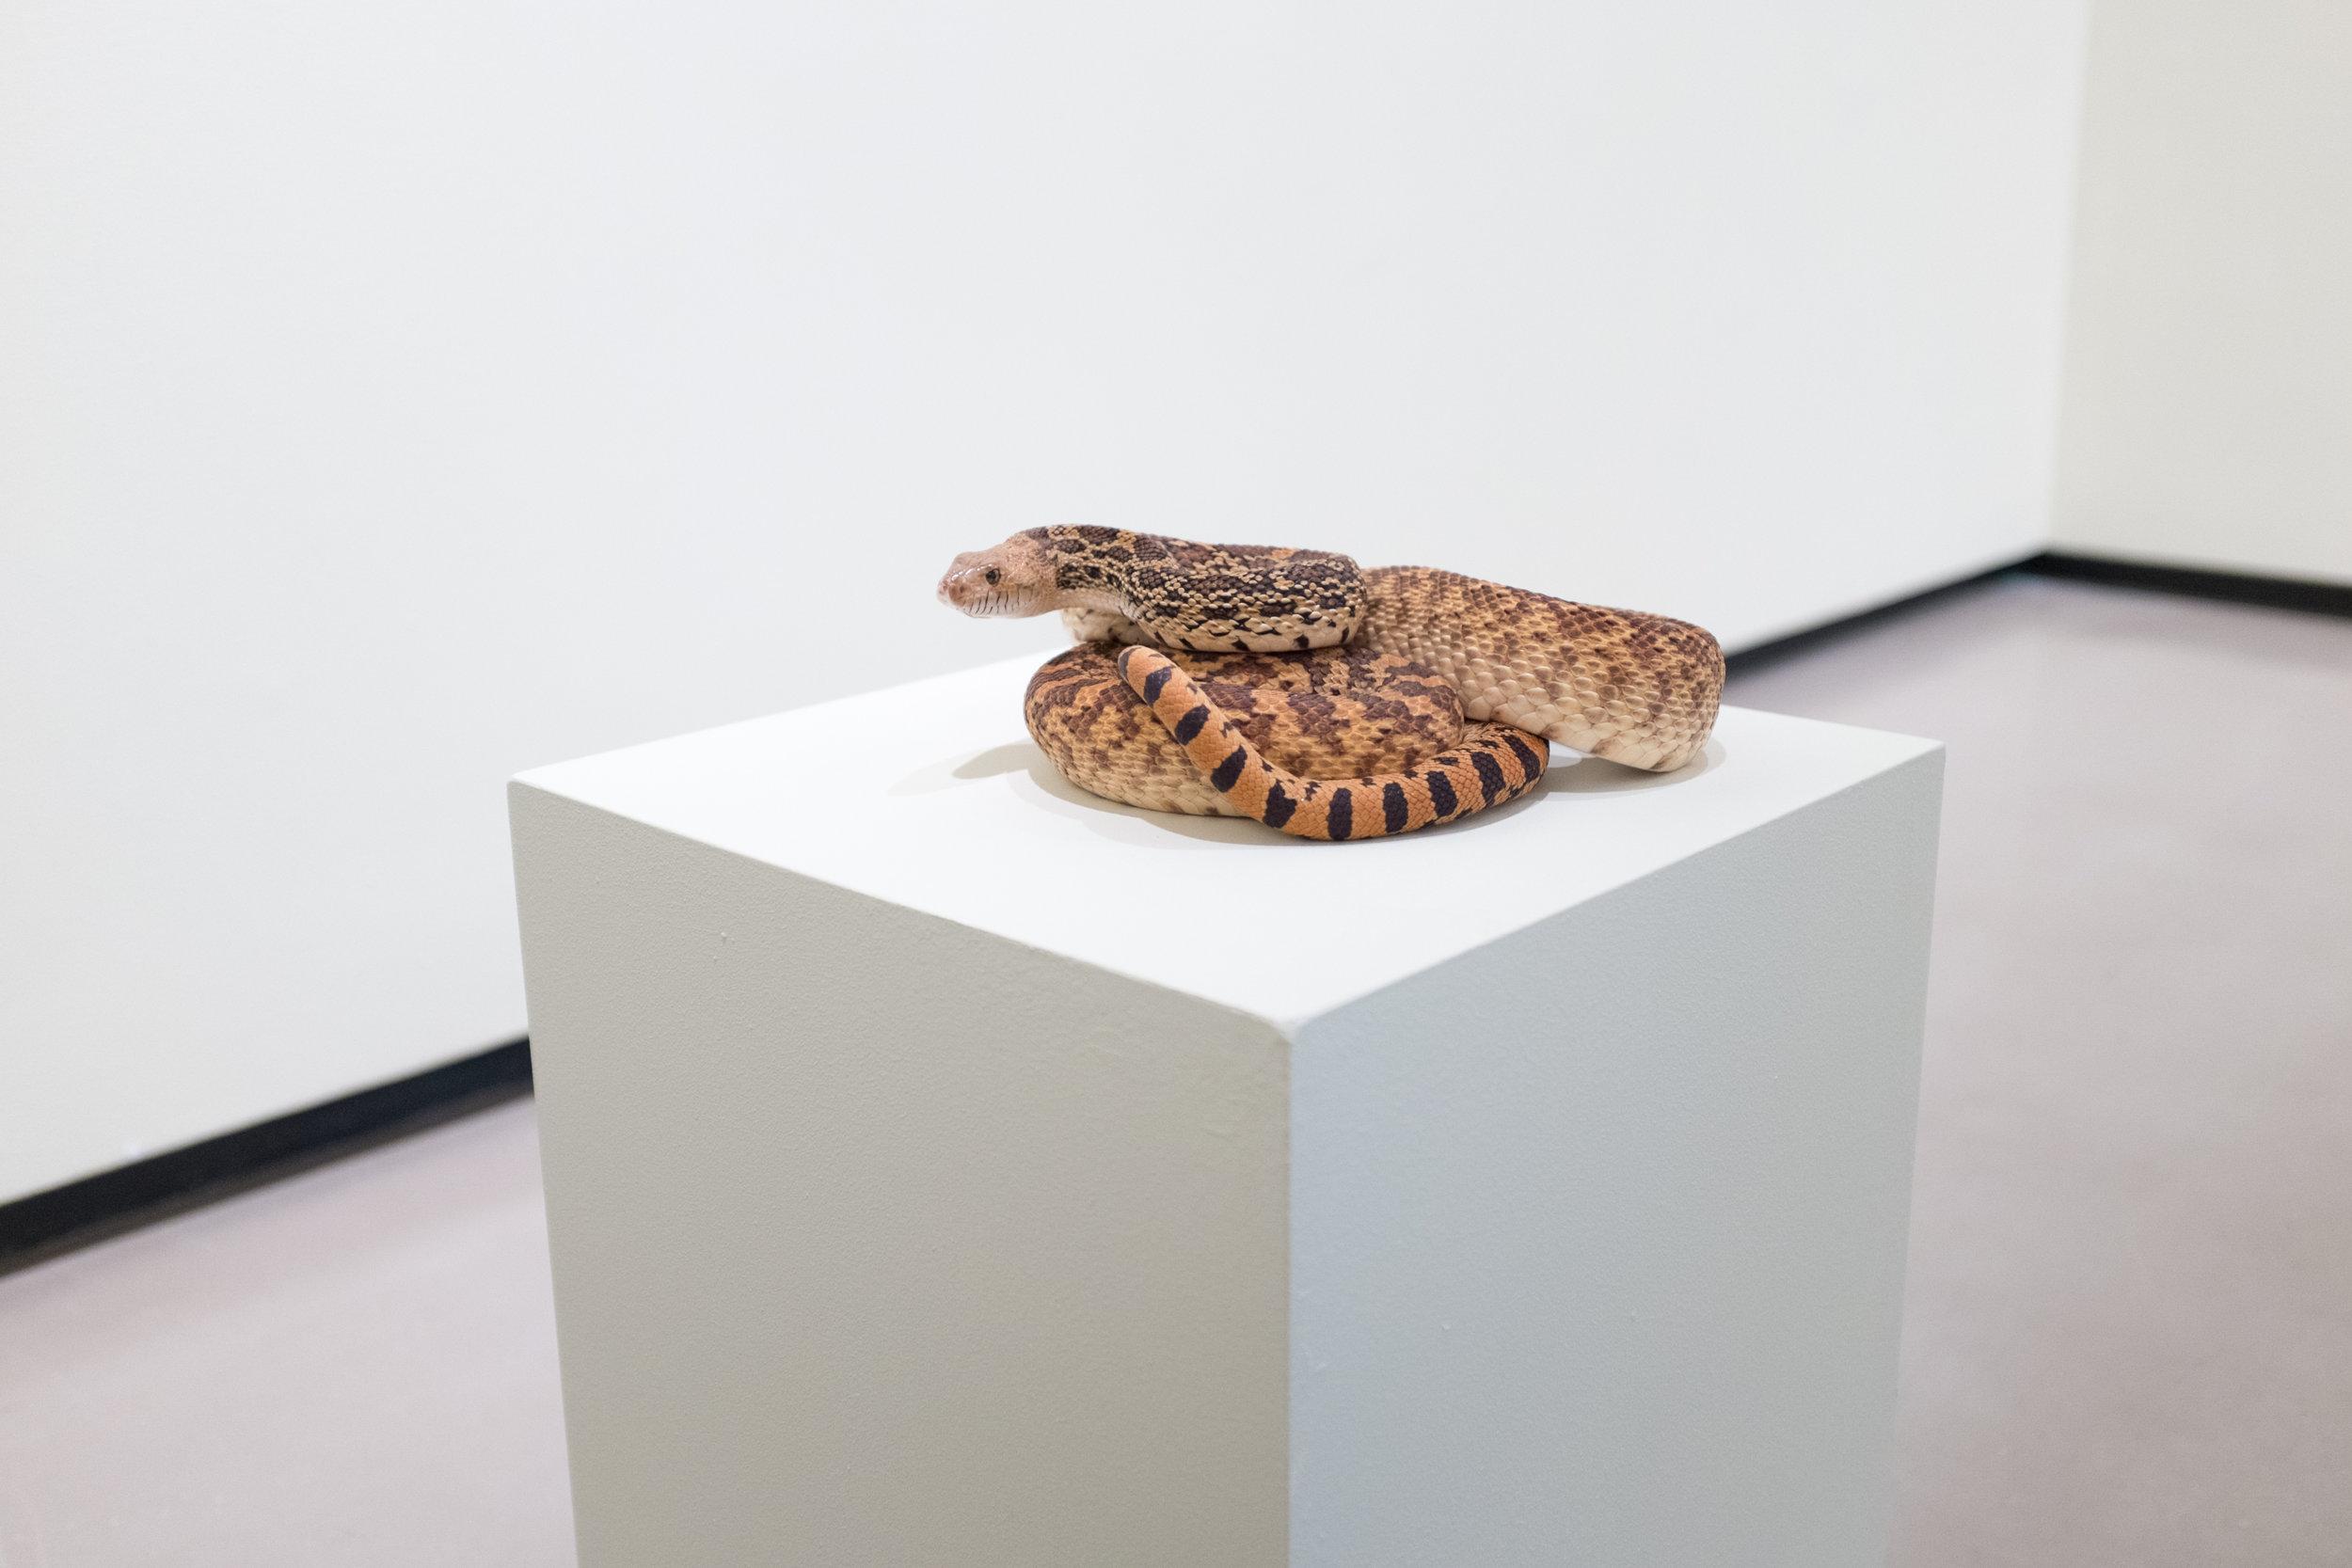 naturalia_joo_hustwit_snake.jpg